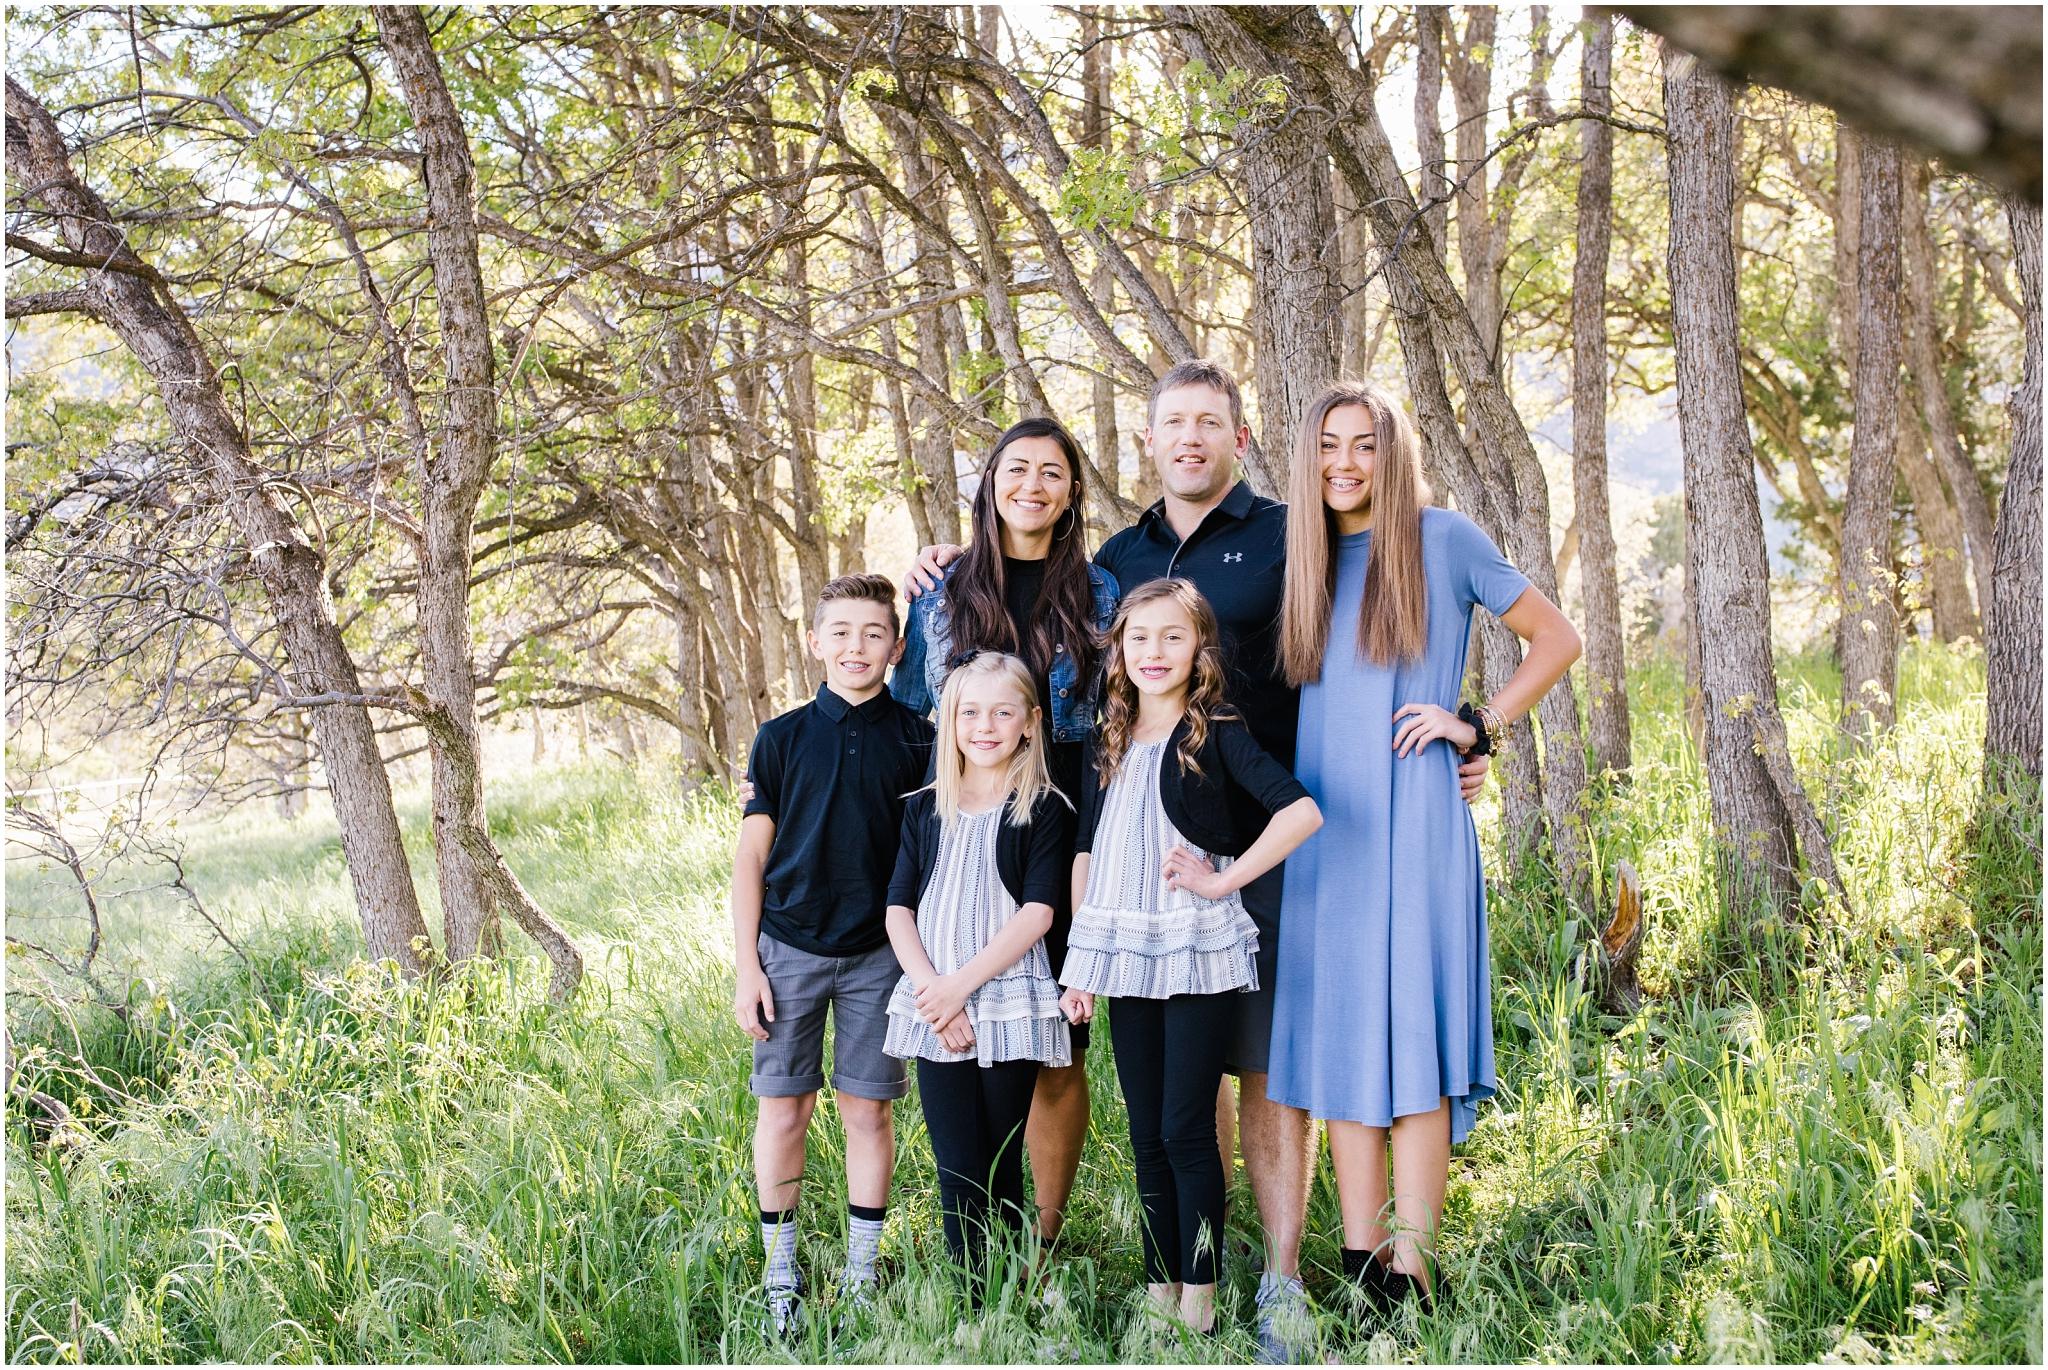 Bagley-31_Lizzie-B-Imagery-Utah-Family-Photographer-Central-Utah-Photographer-Utah-County-Extended-Family.jpg